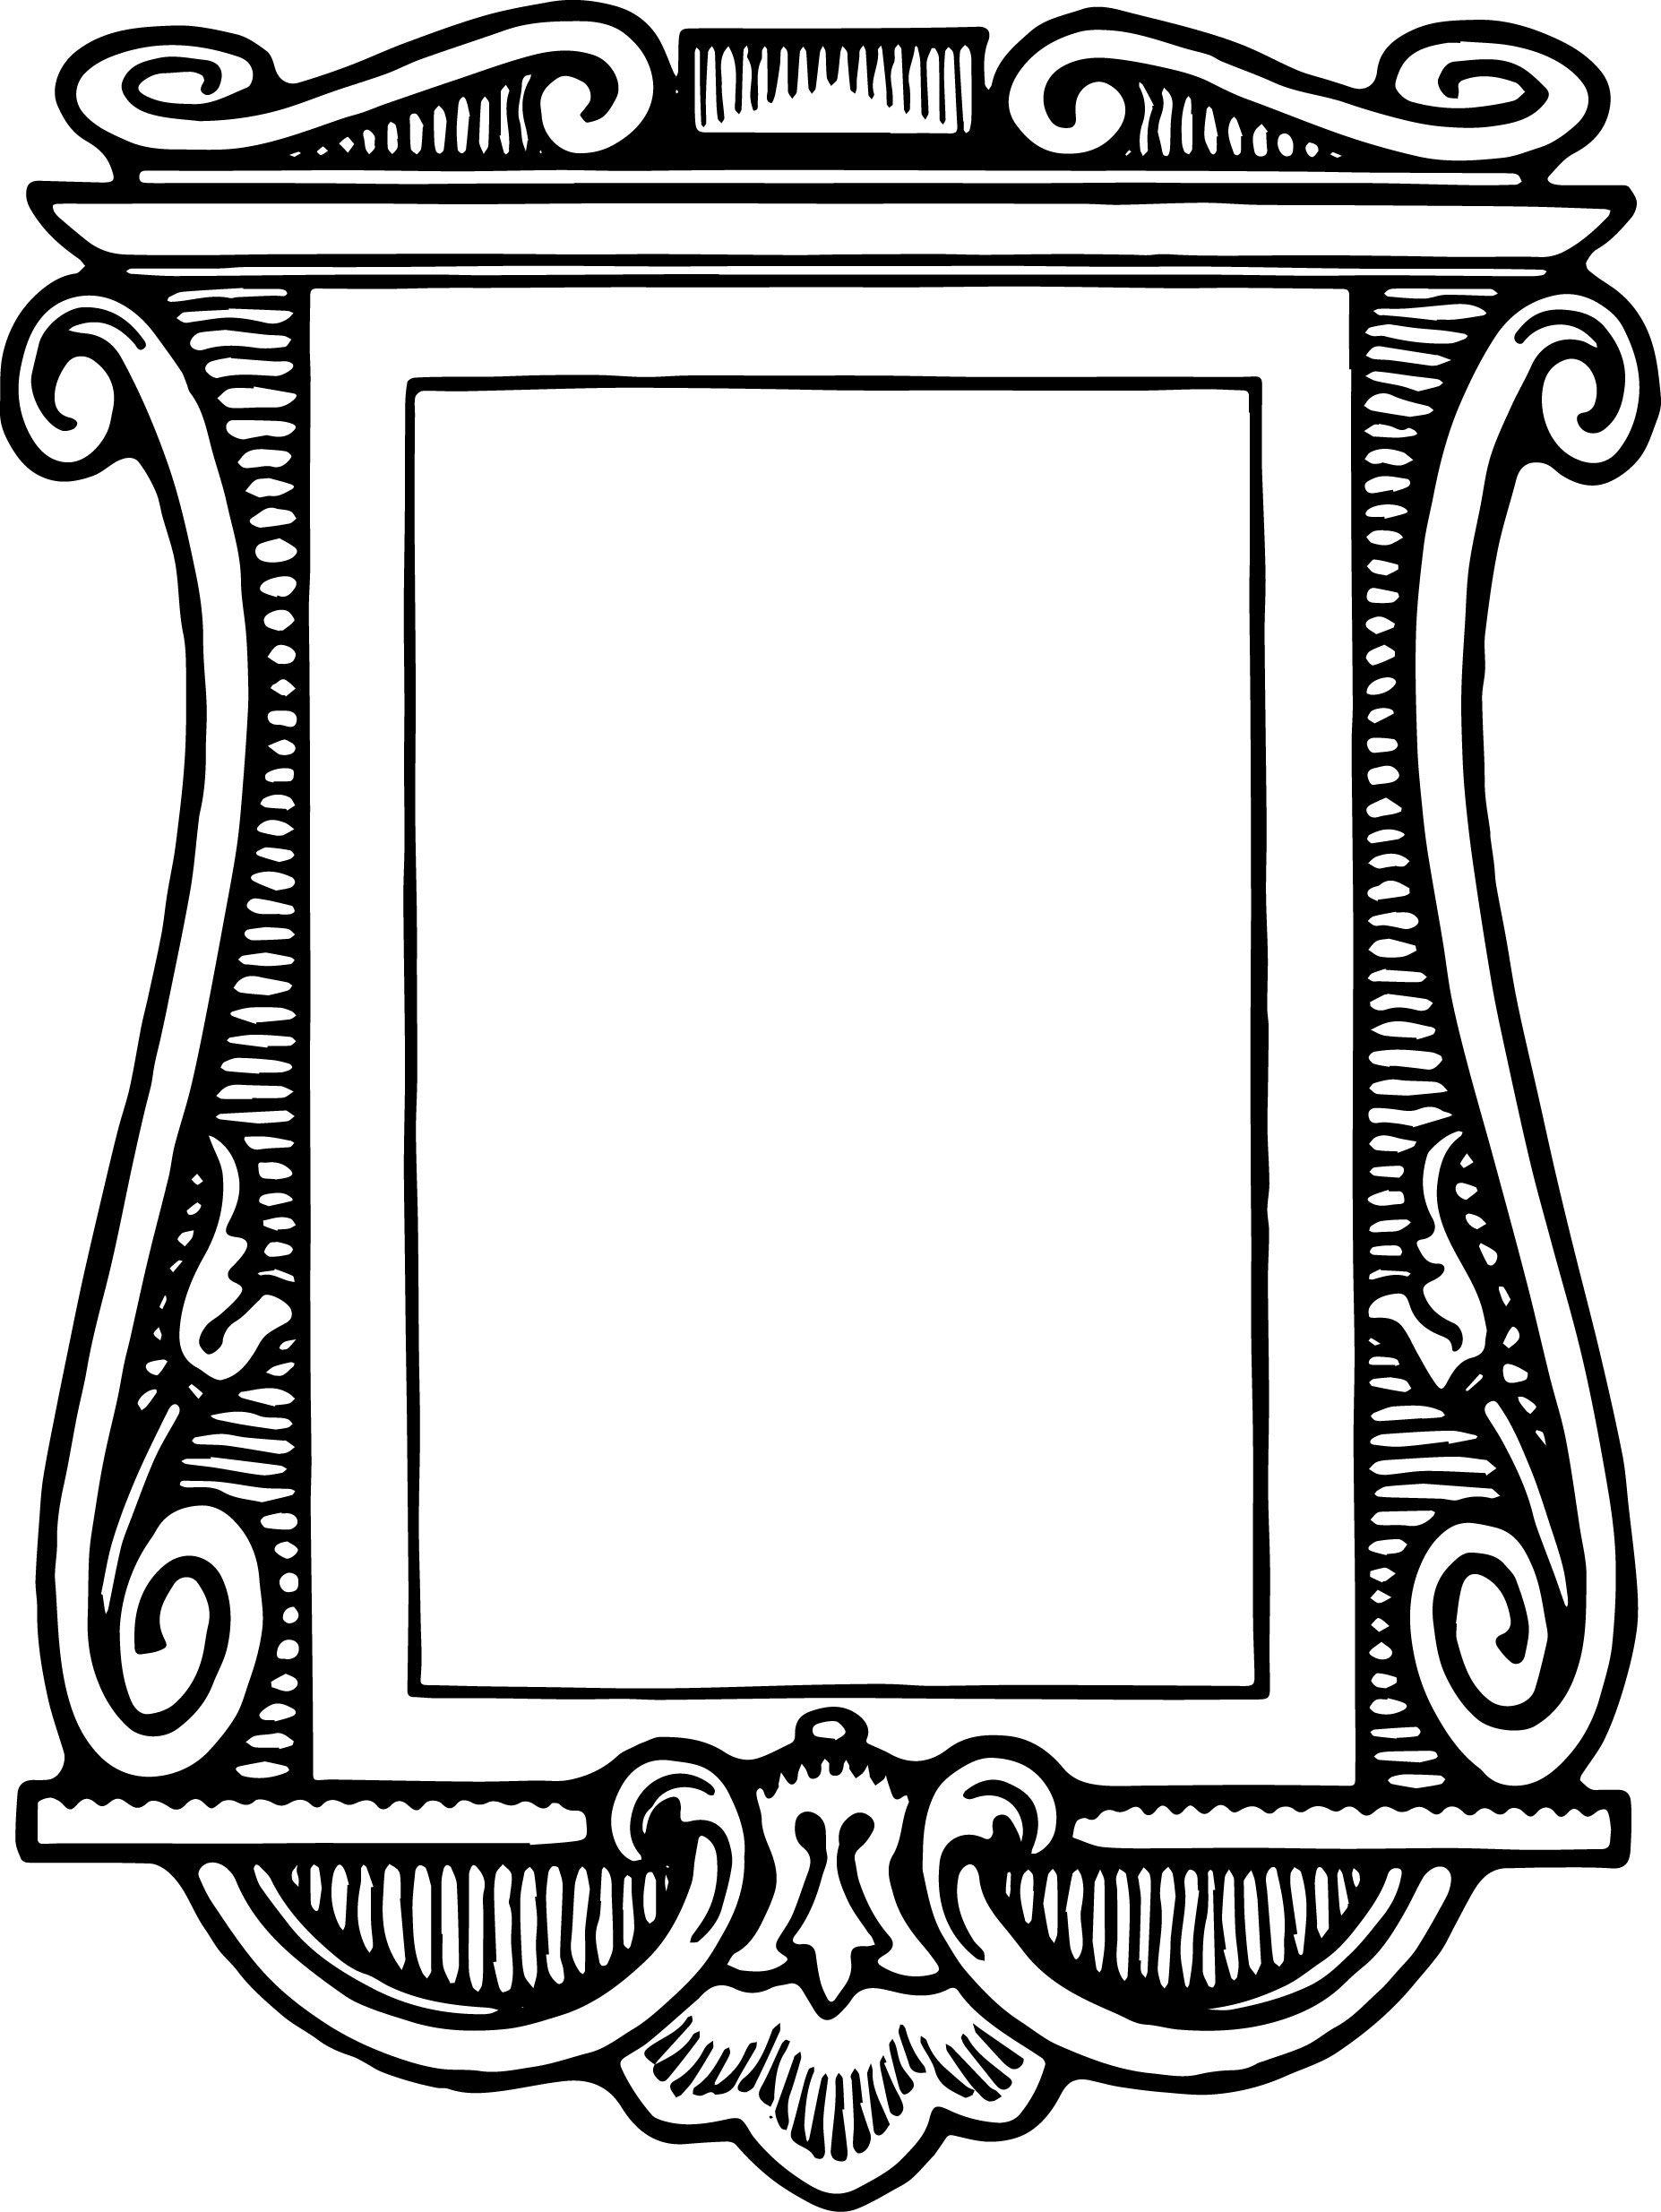 Stock Graphics | Frame clipart, Vintage frames, Clip art